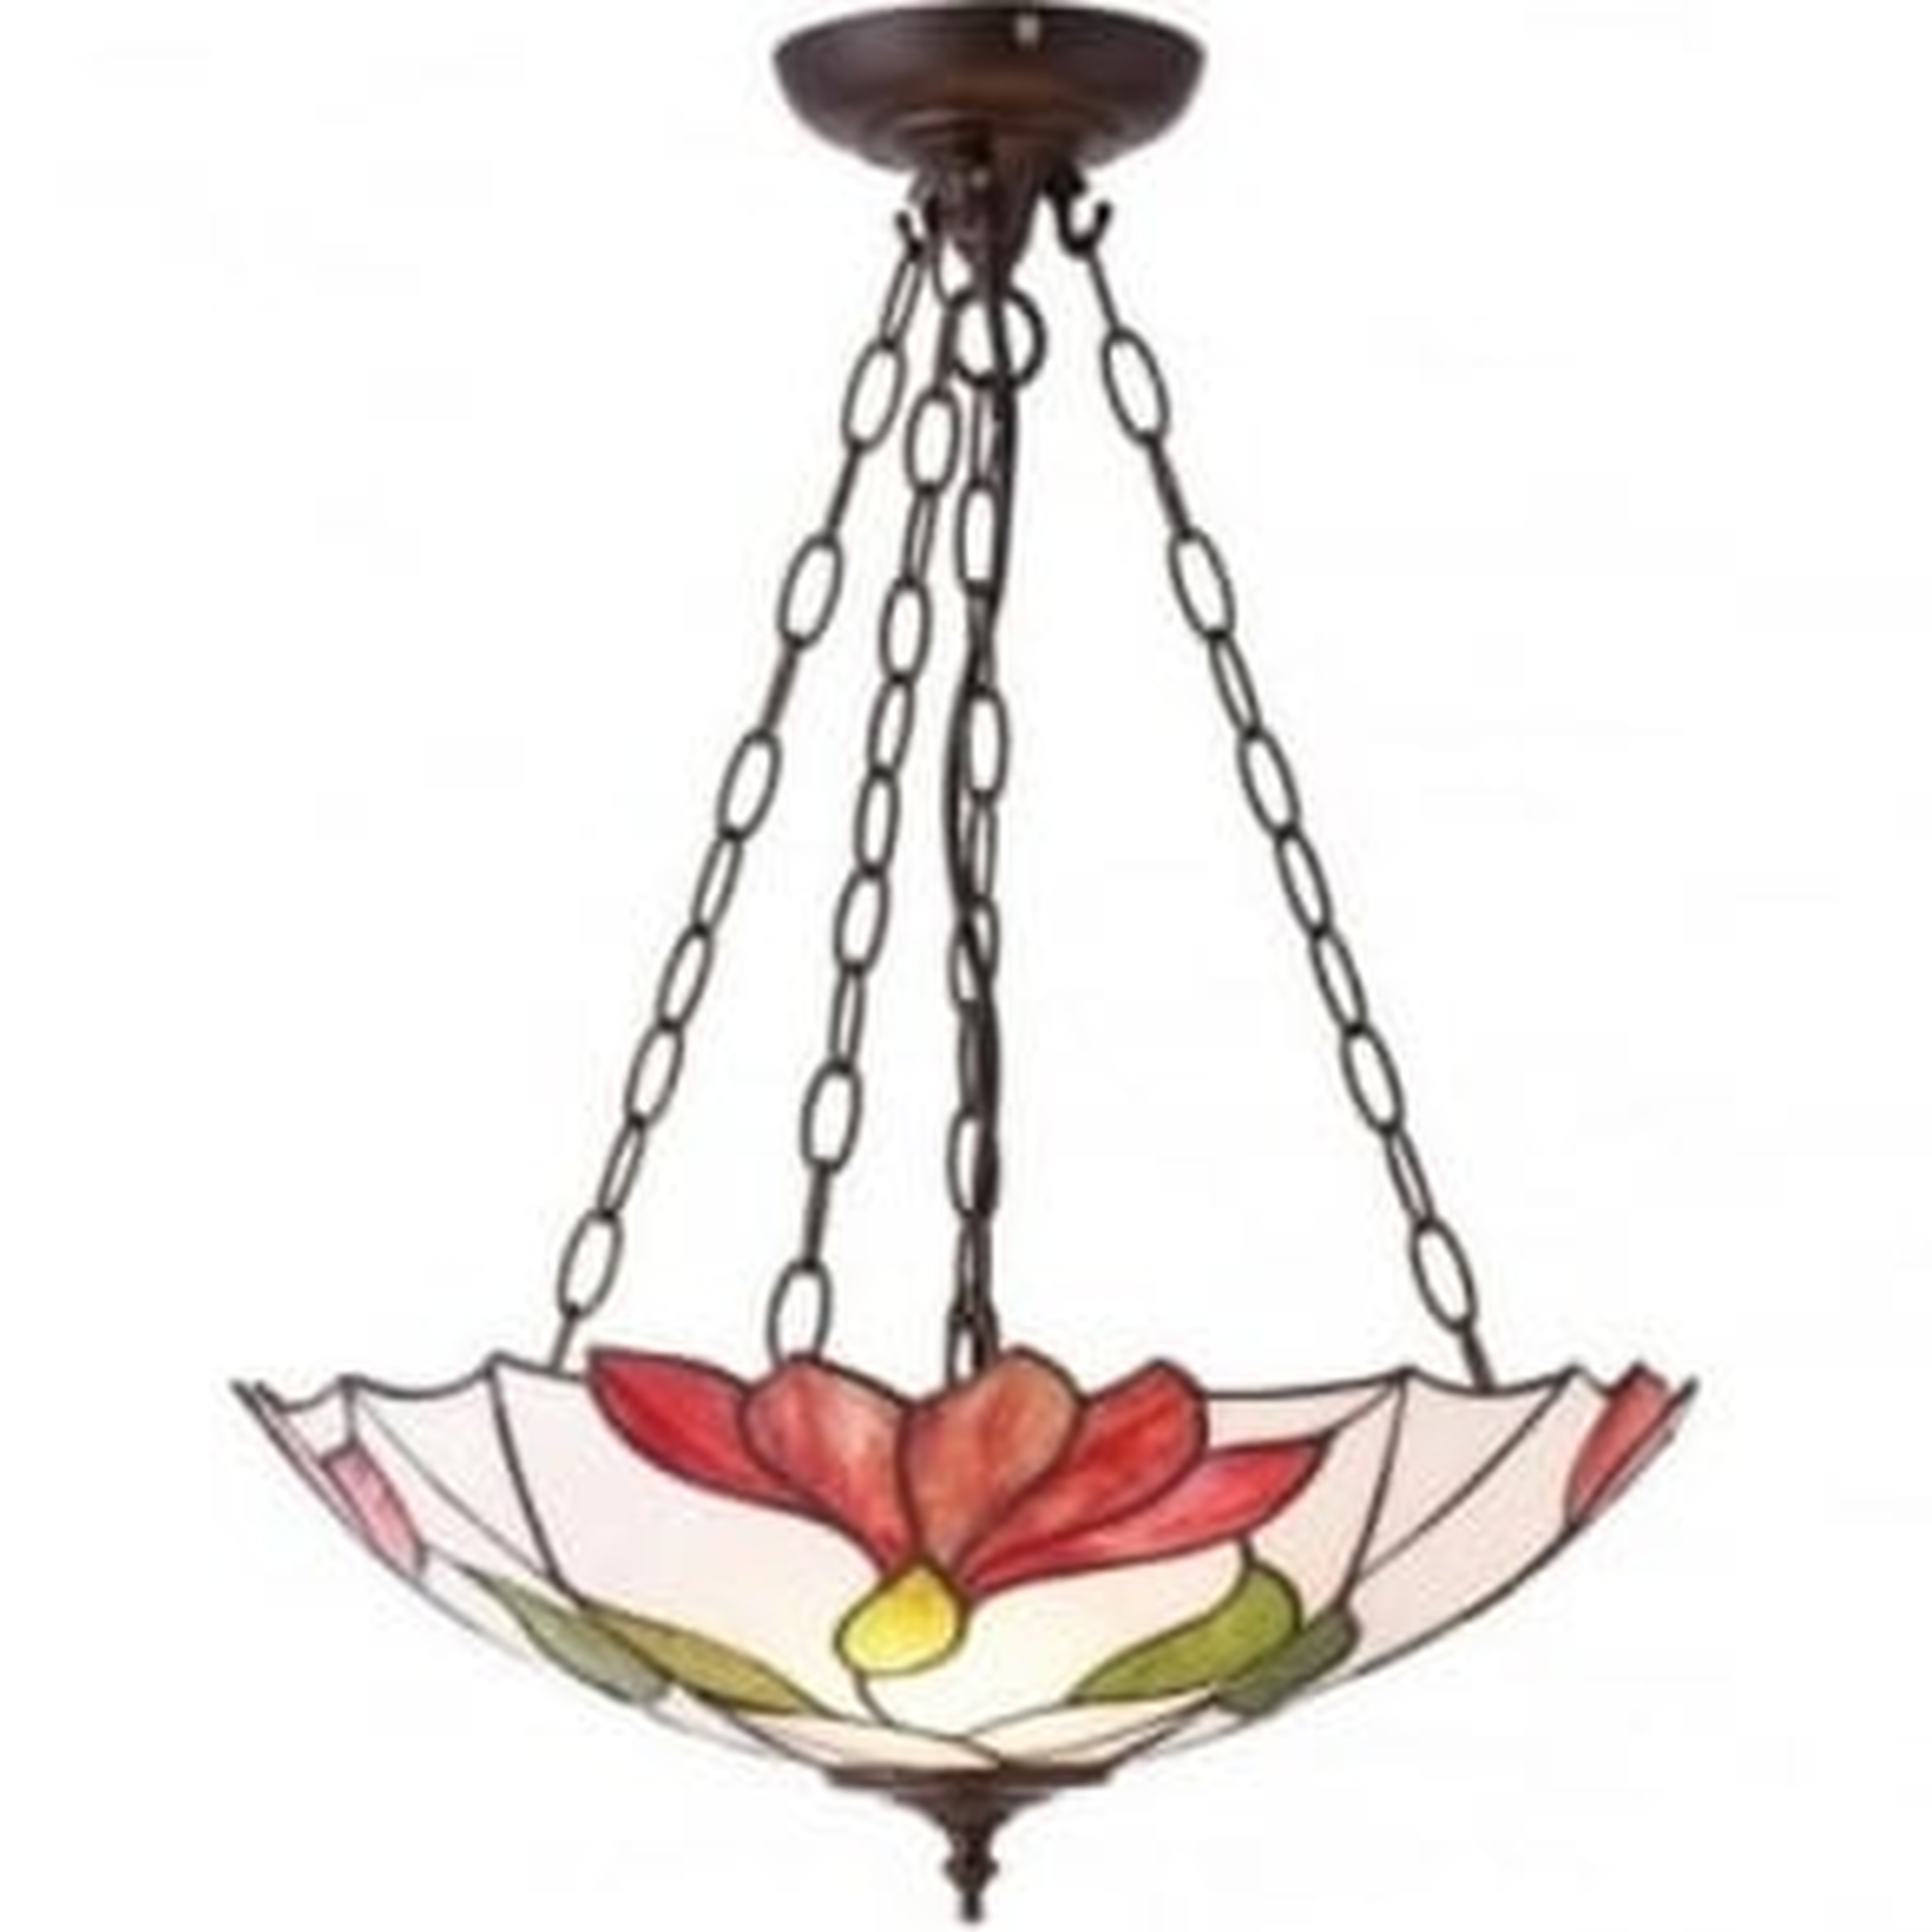 Tiffany Glass Botanica inverted 3 light pendant